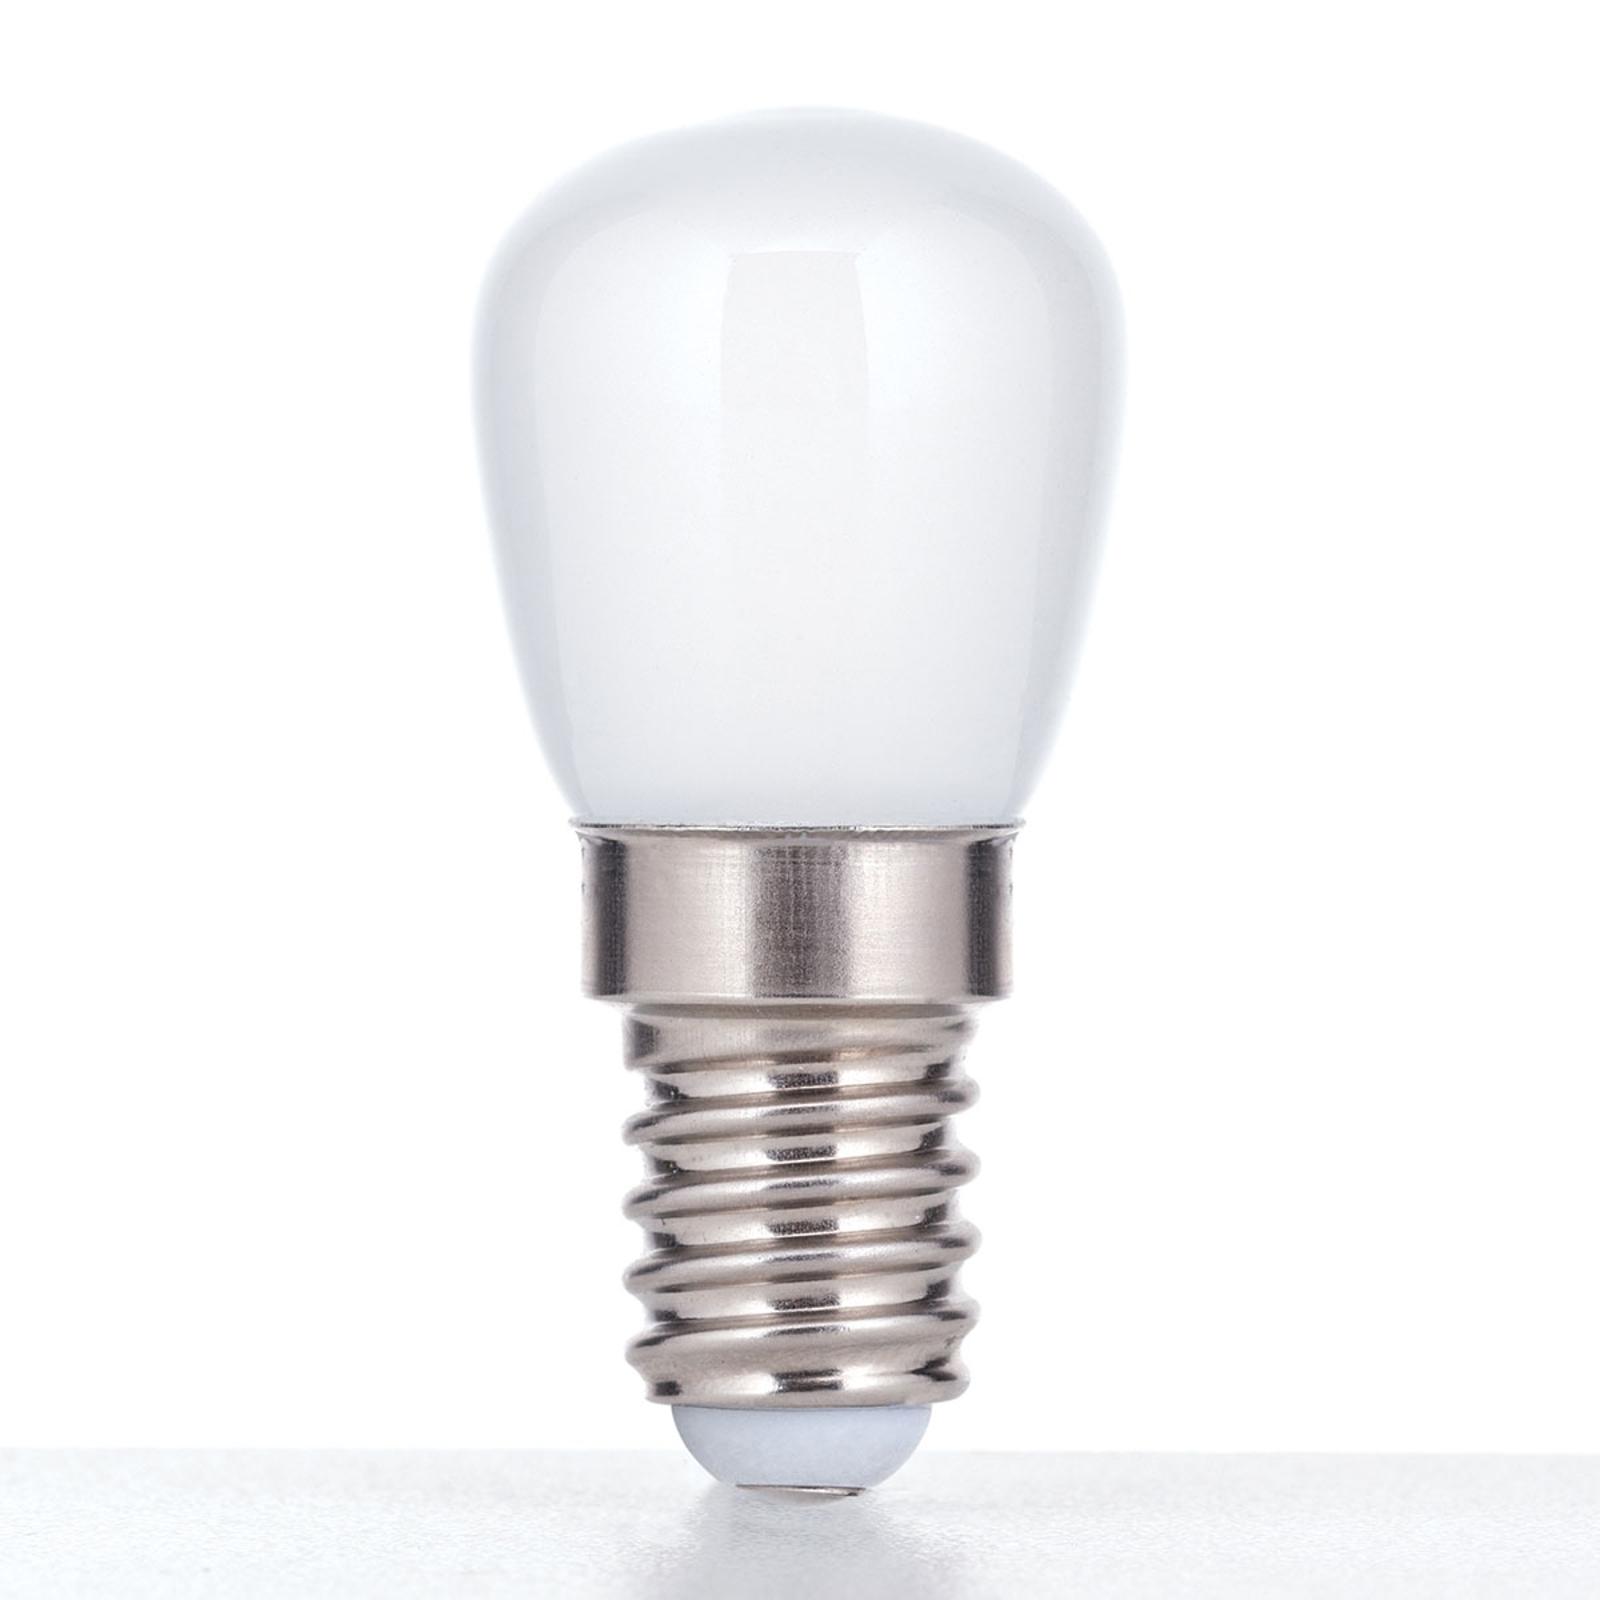 LED-Kühlschranklampe E14 1,2W, opal, warmweiß